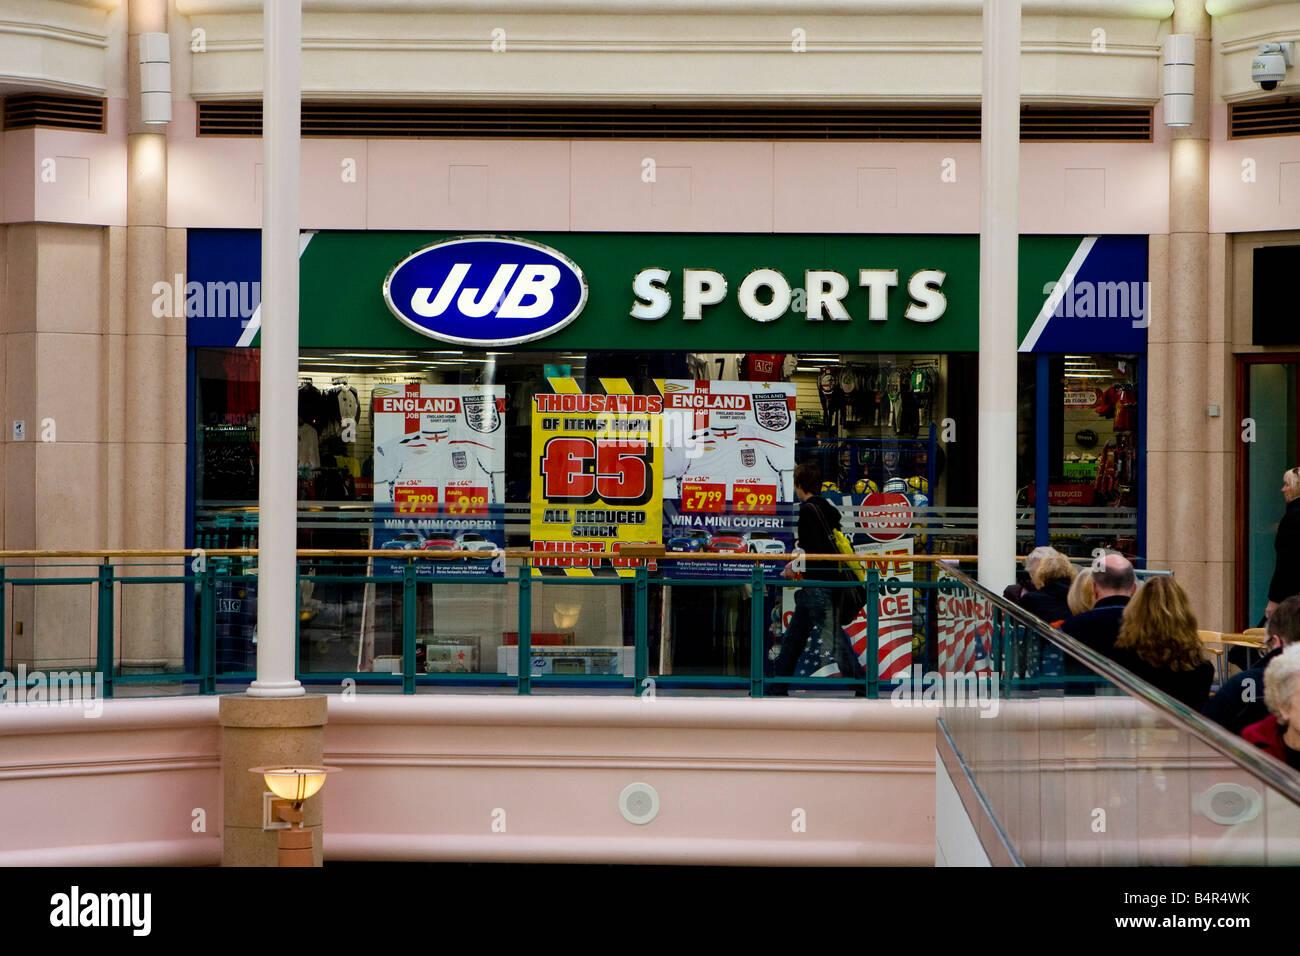 JJB Sports - Stock Image